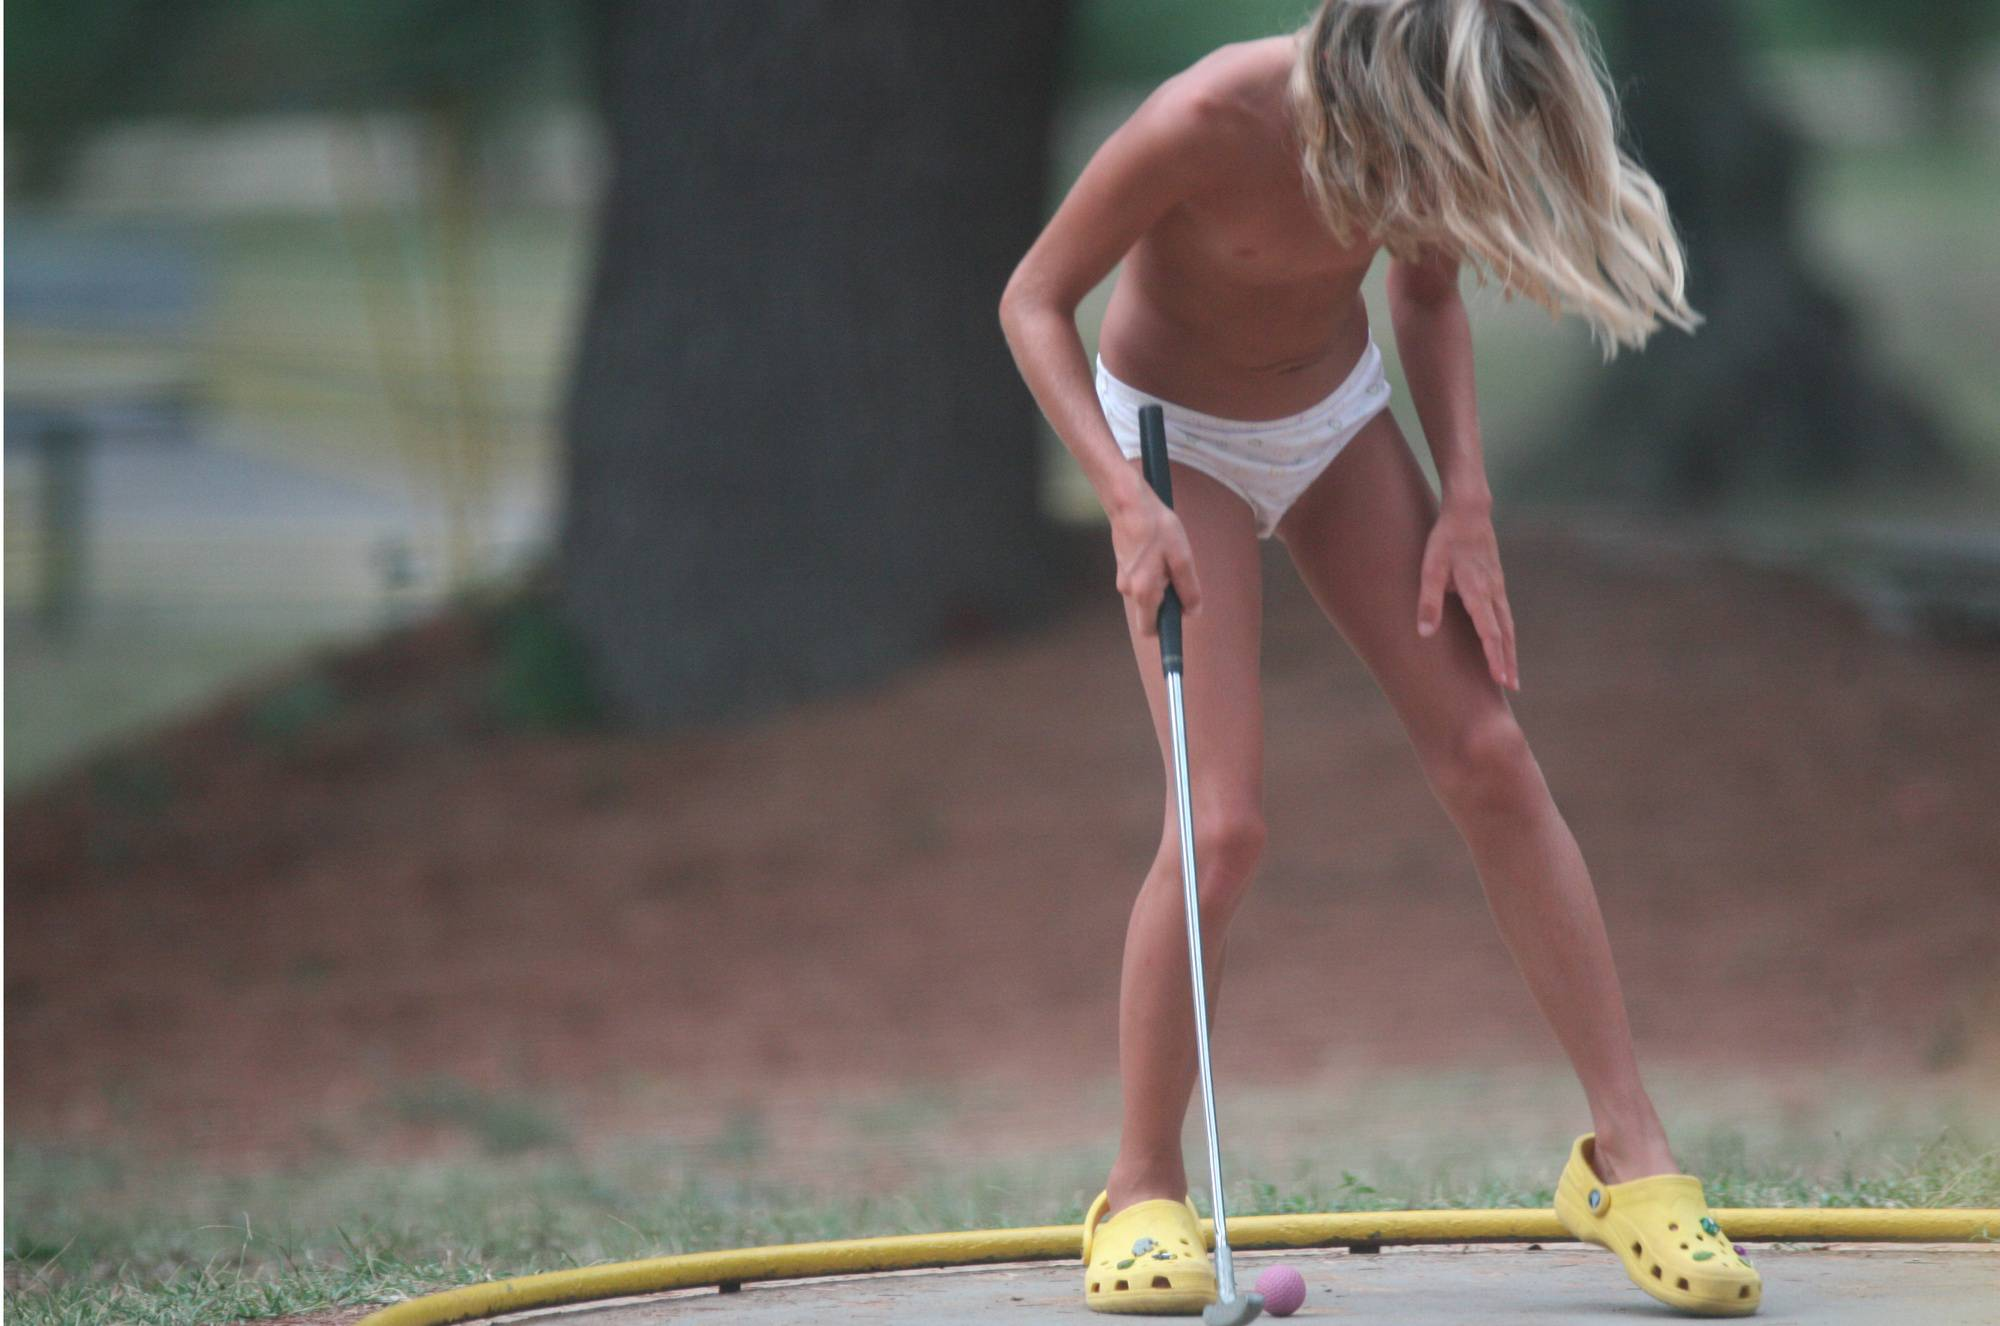 Purenudism Images-Mini-Golf Nude Participants - 1